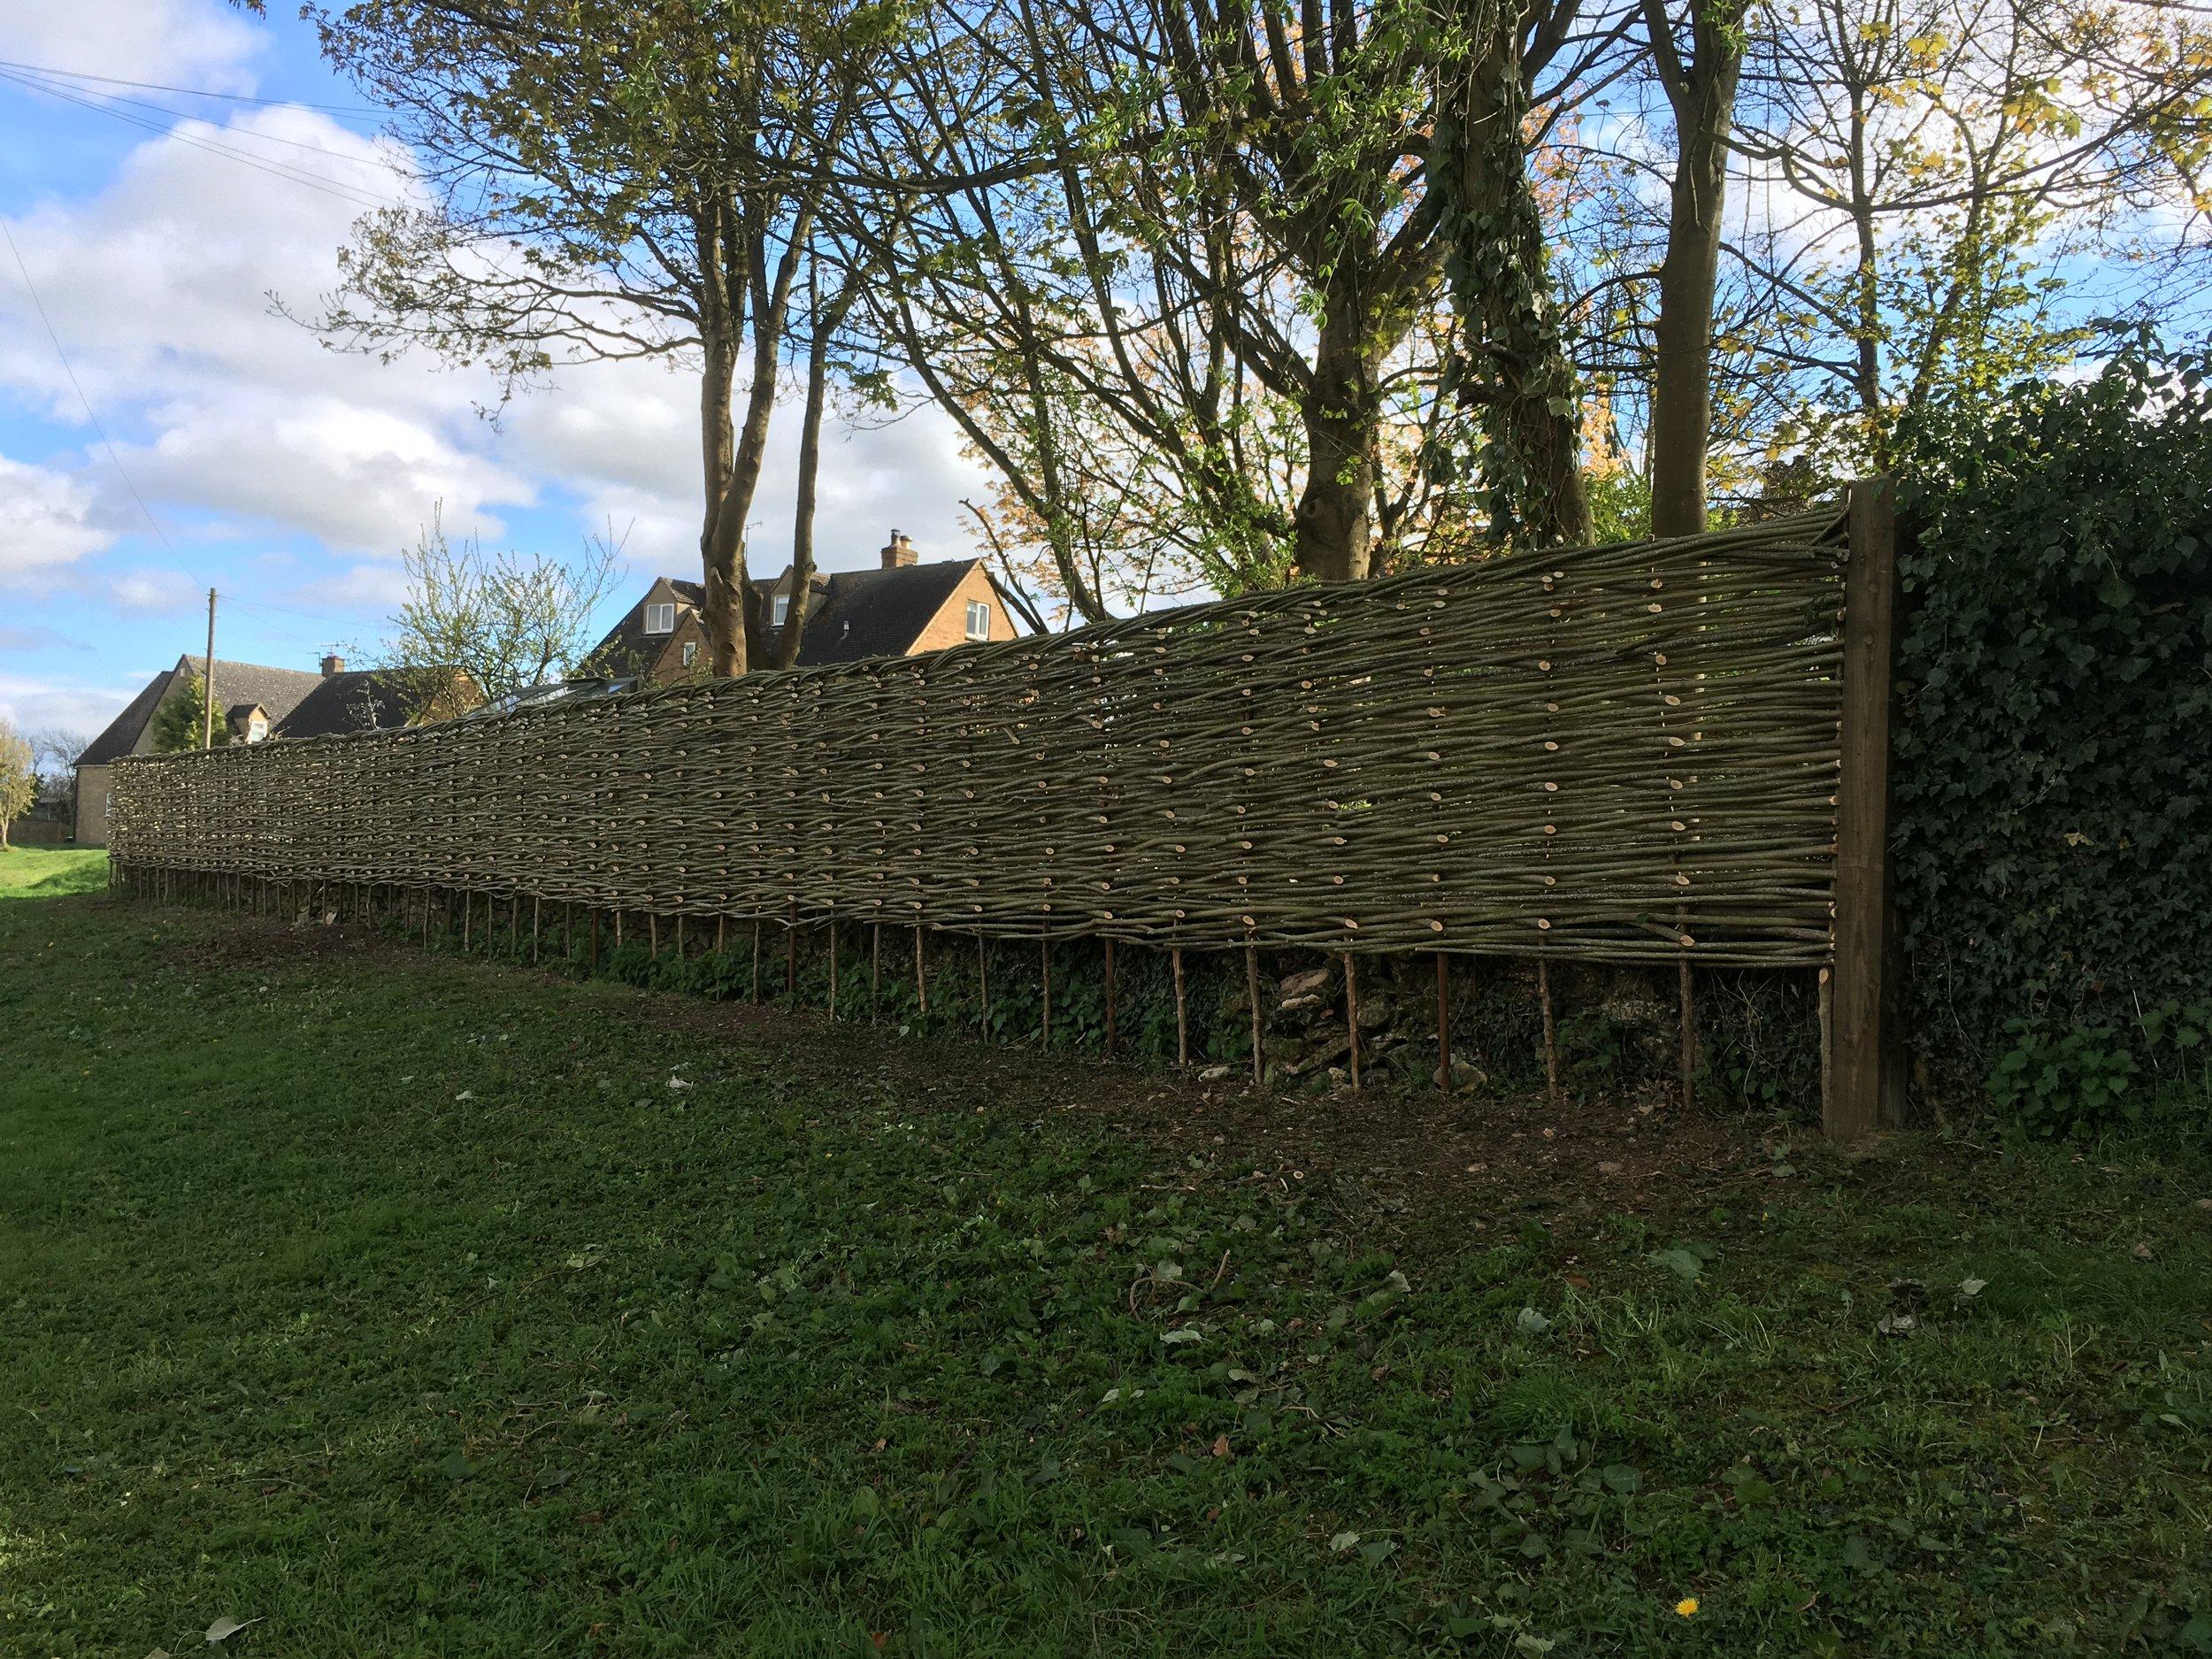 Wicker privacy fence